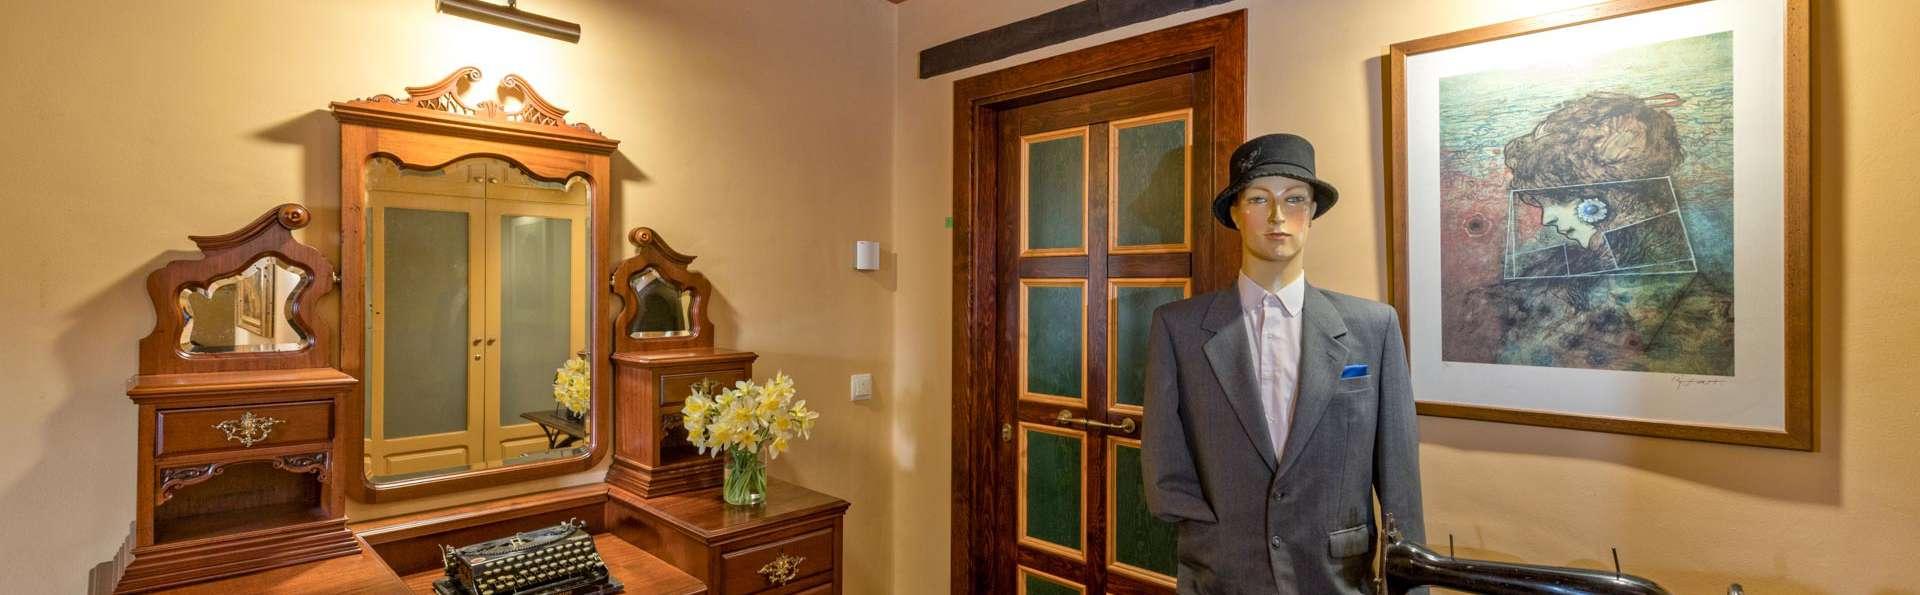 Hotel Cal Sastre - EDIT_LOBBY_02.jpg